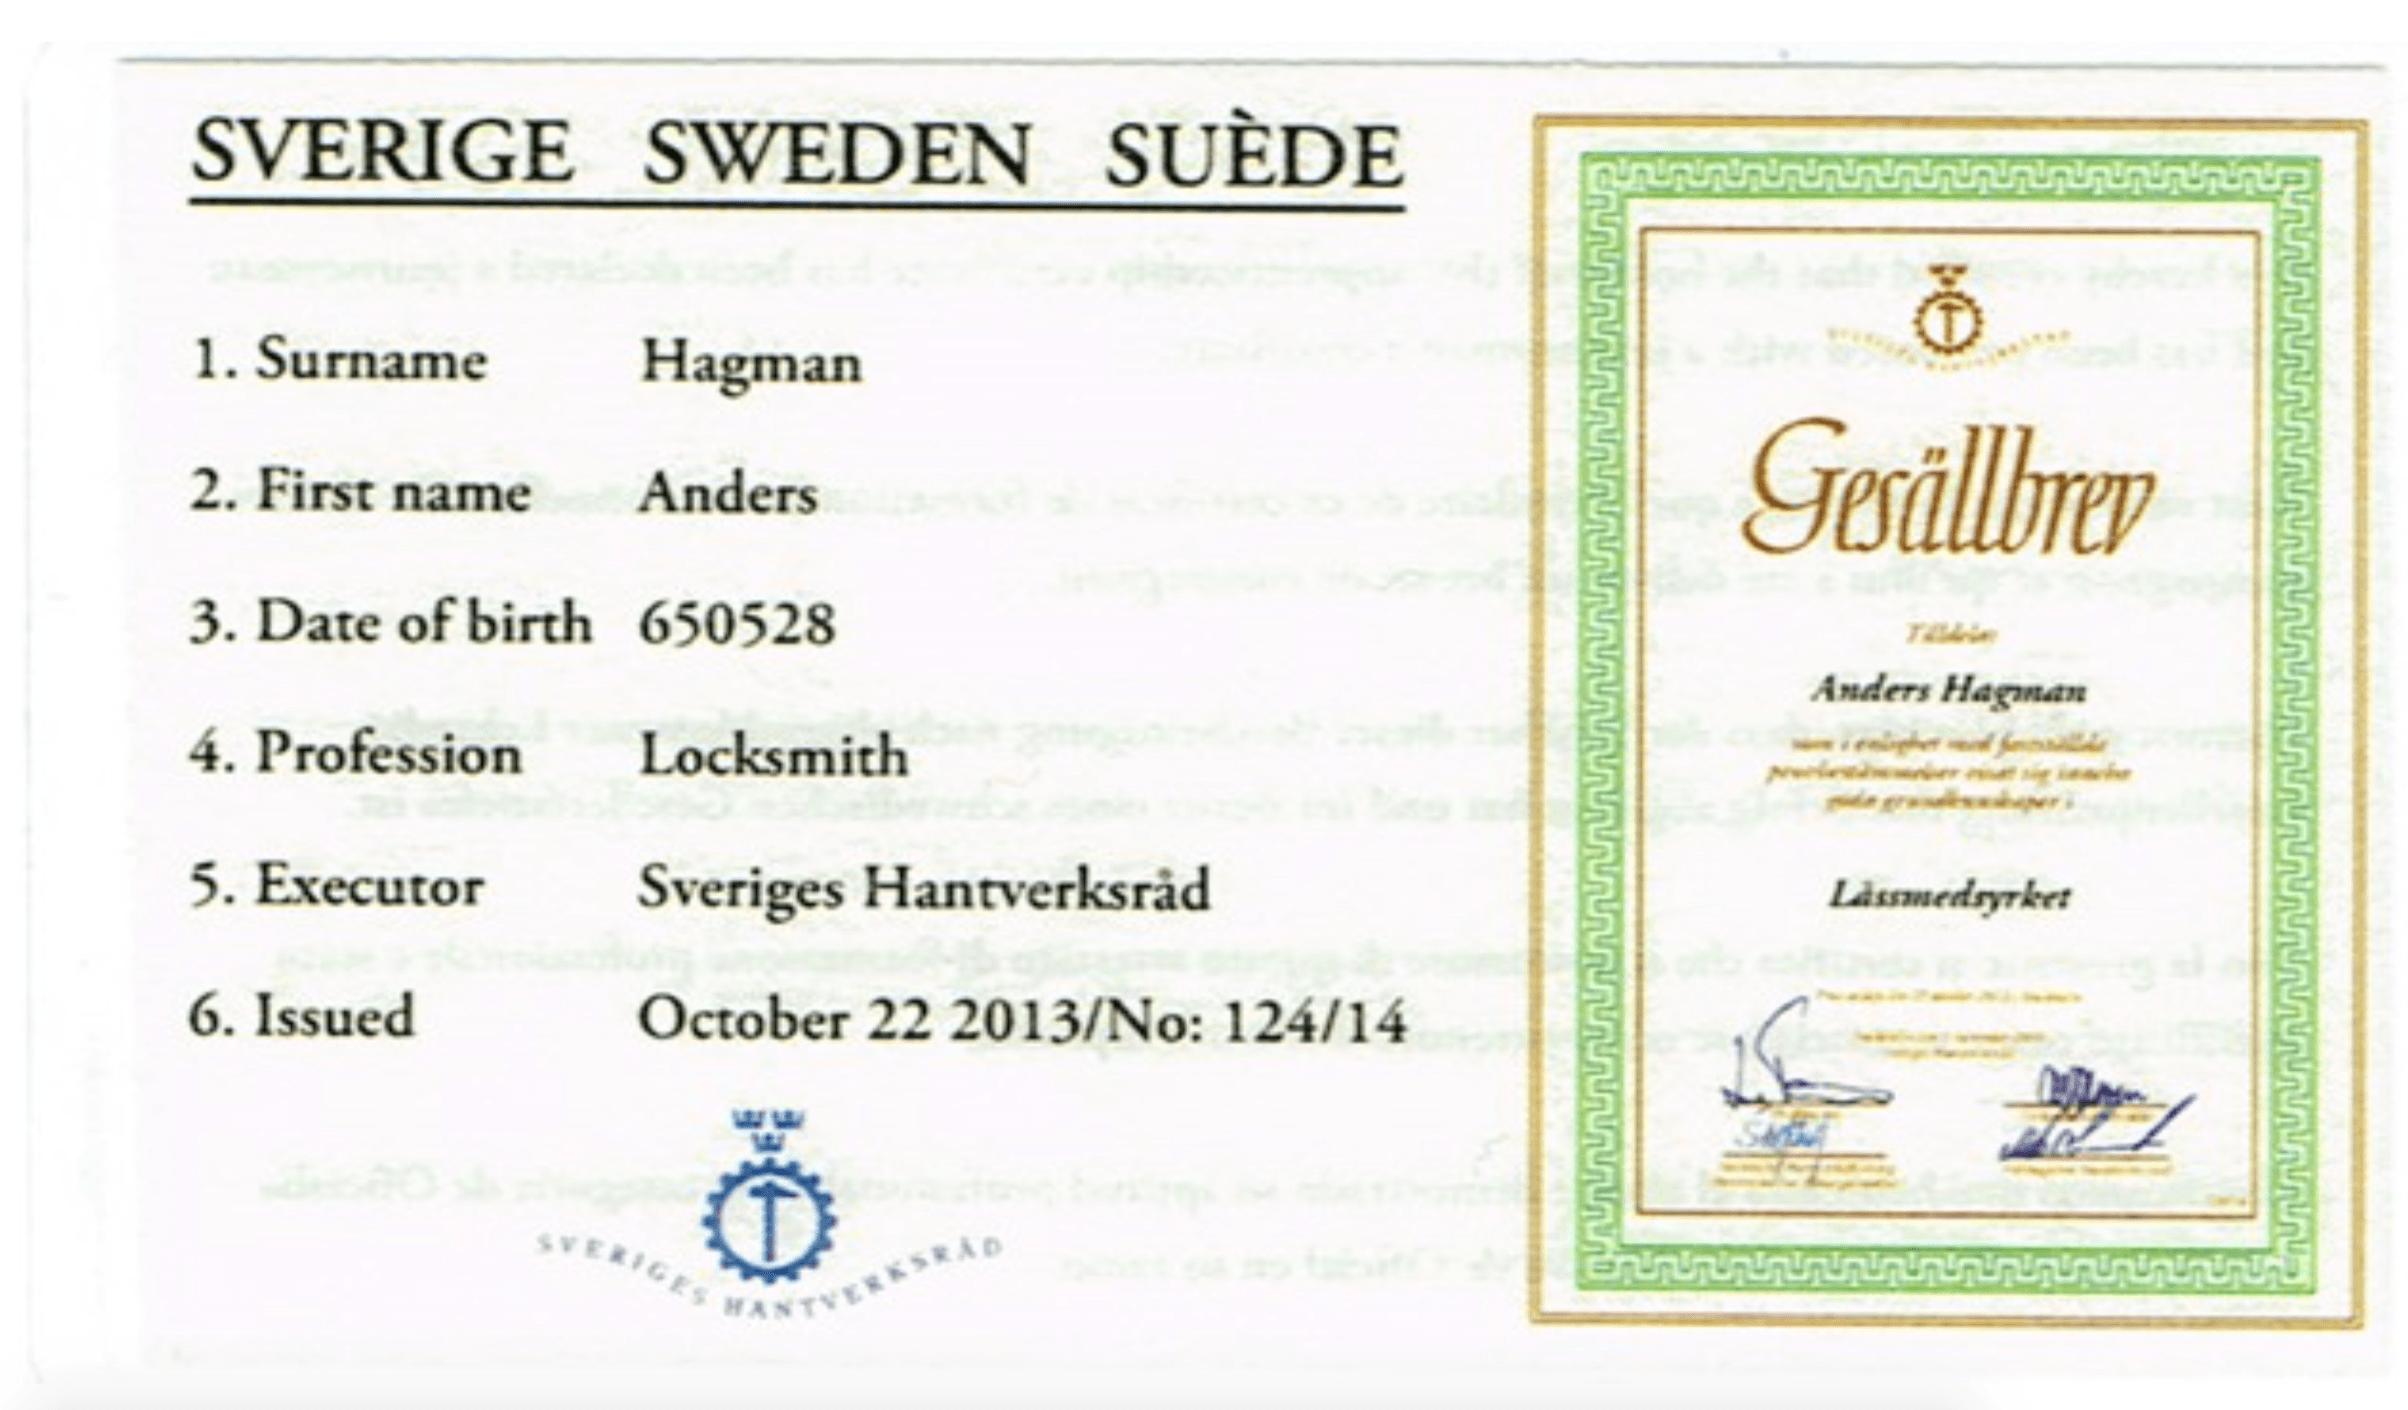 Anders Hagman gesällbrev